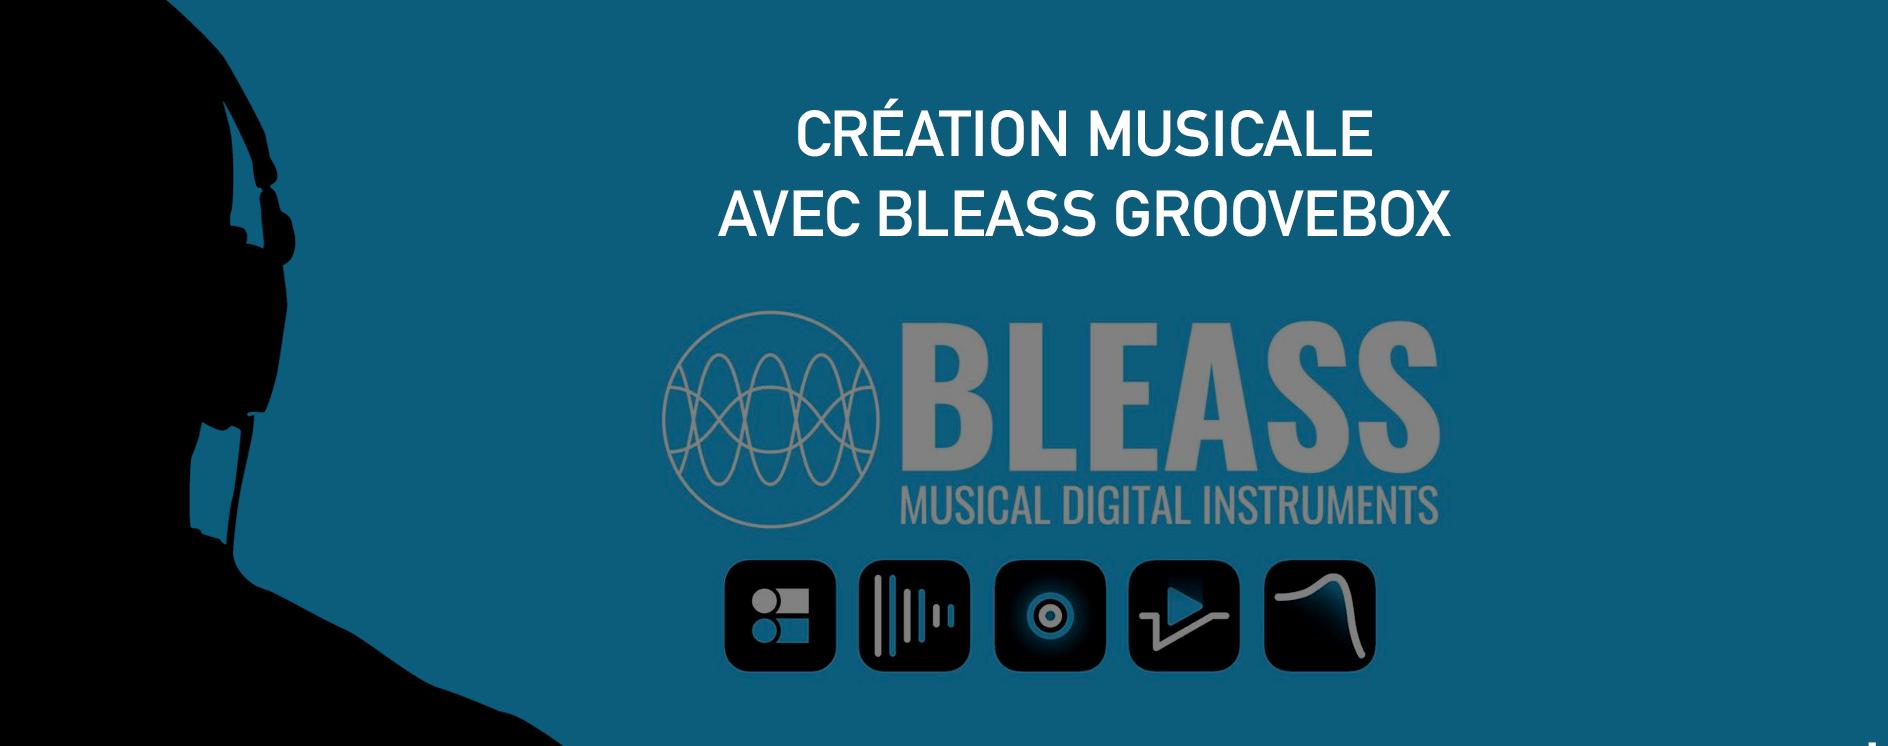 Création Musicale avec Bleass Groovebox